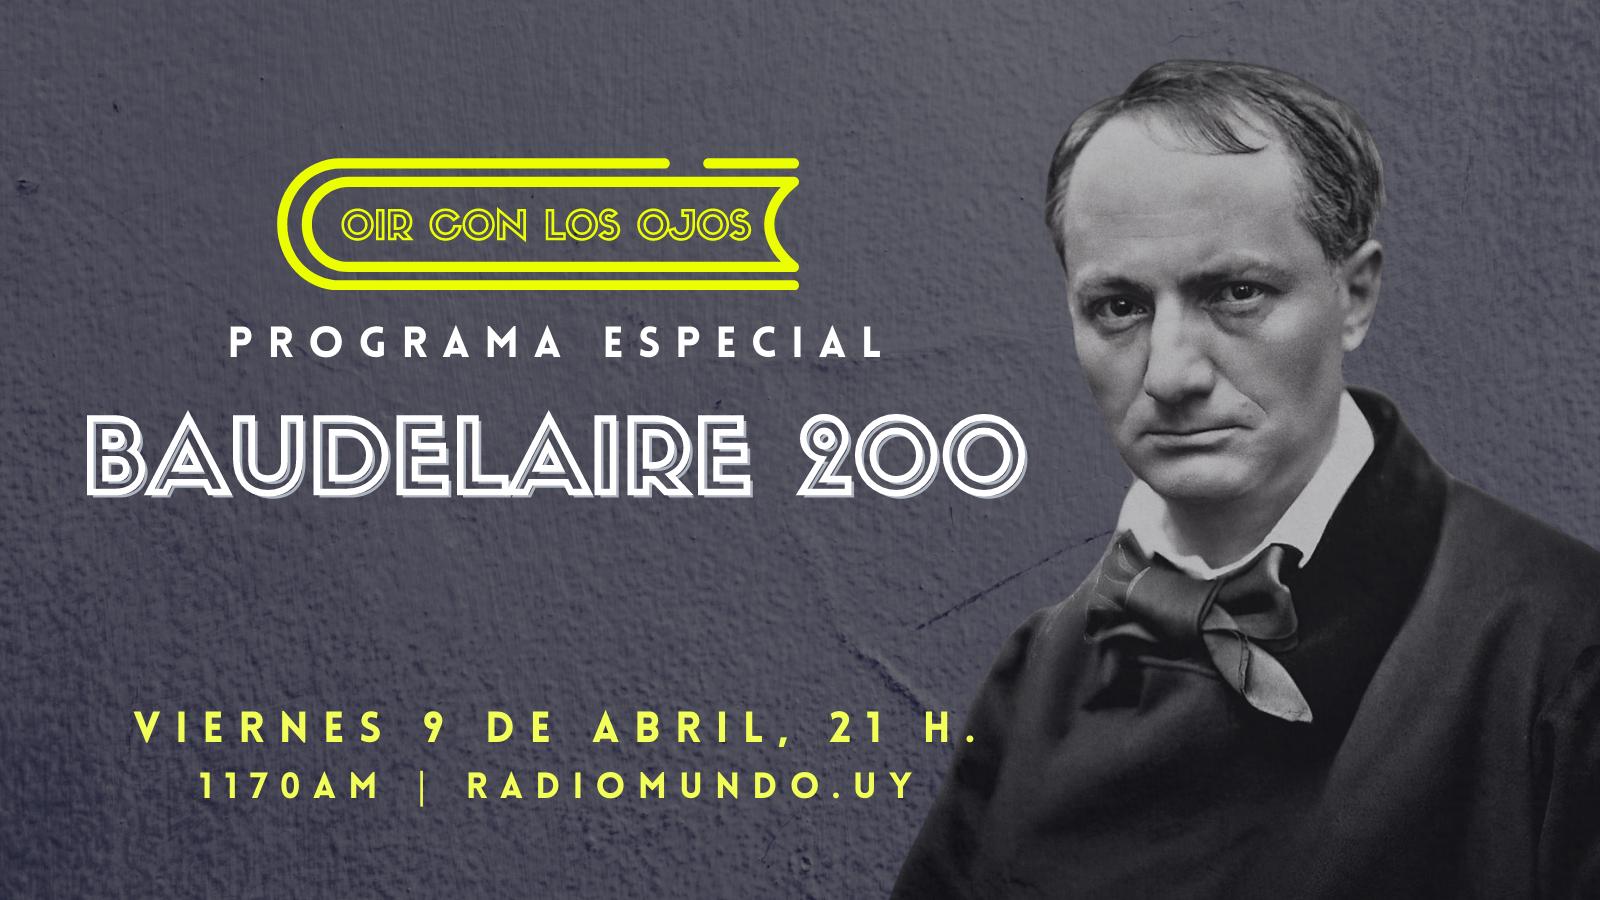 Baudelaire 200